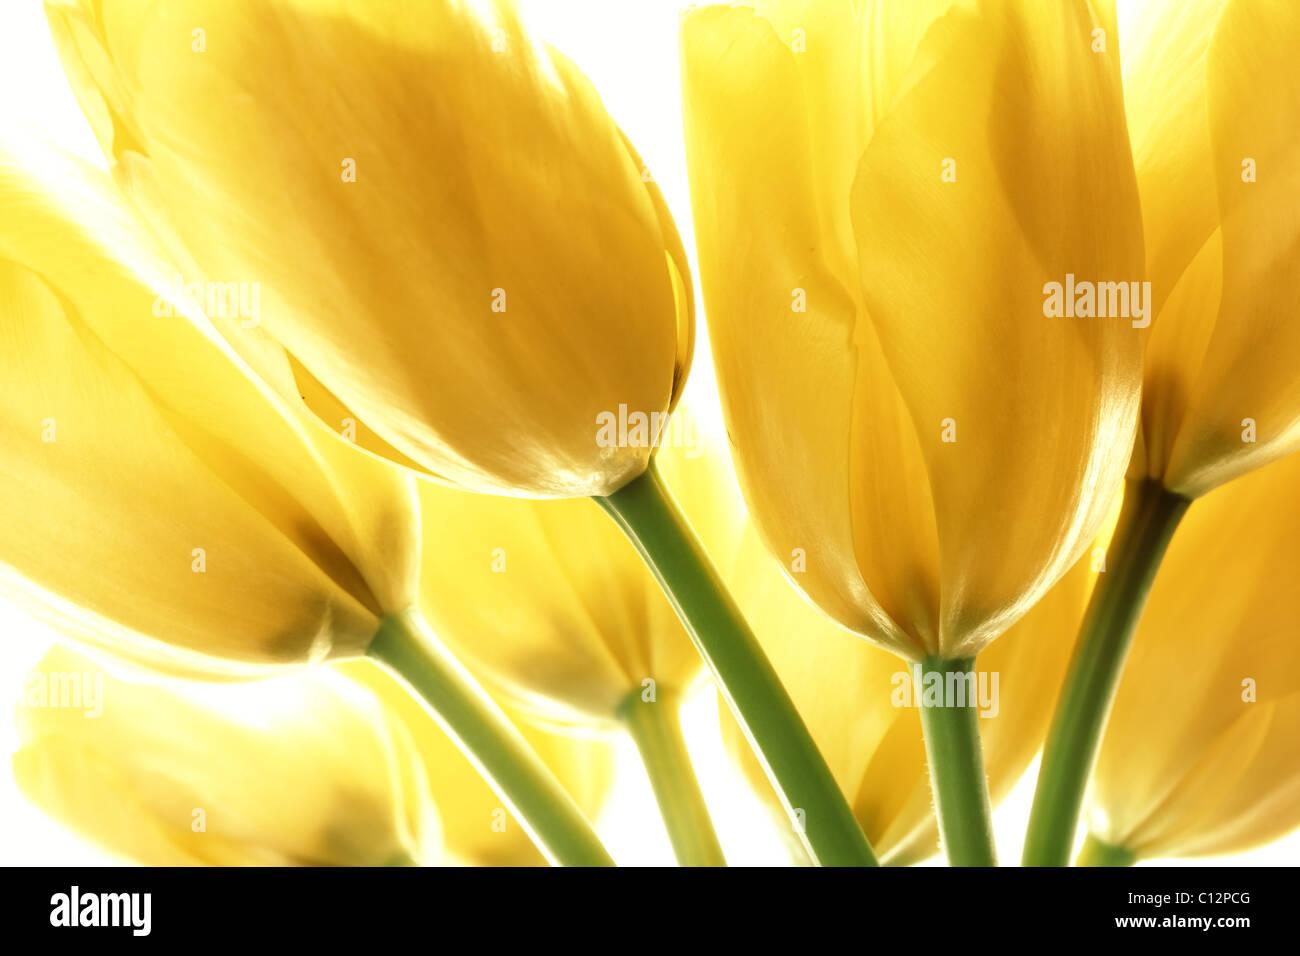 Tulipani gialli isolati su sfondo bianco Immagini Stock